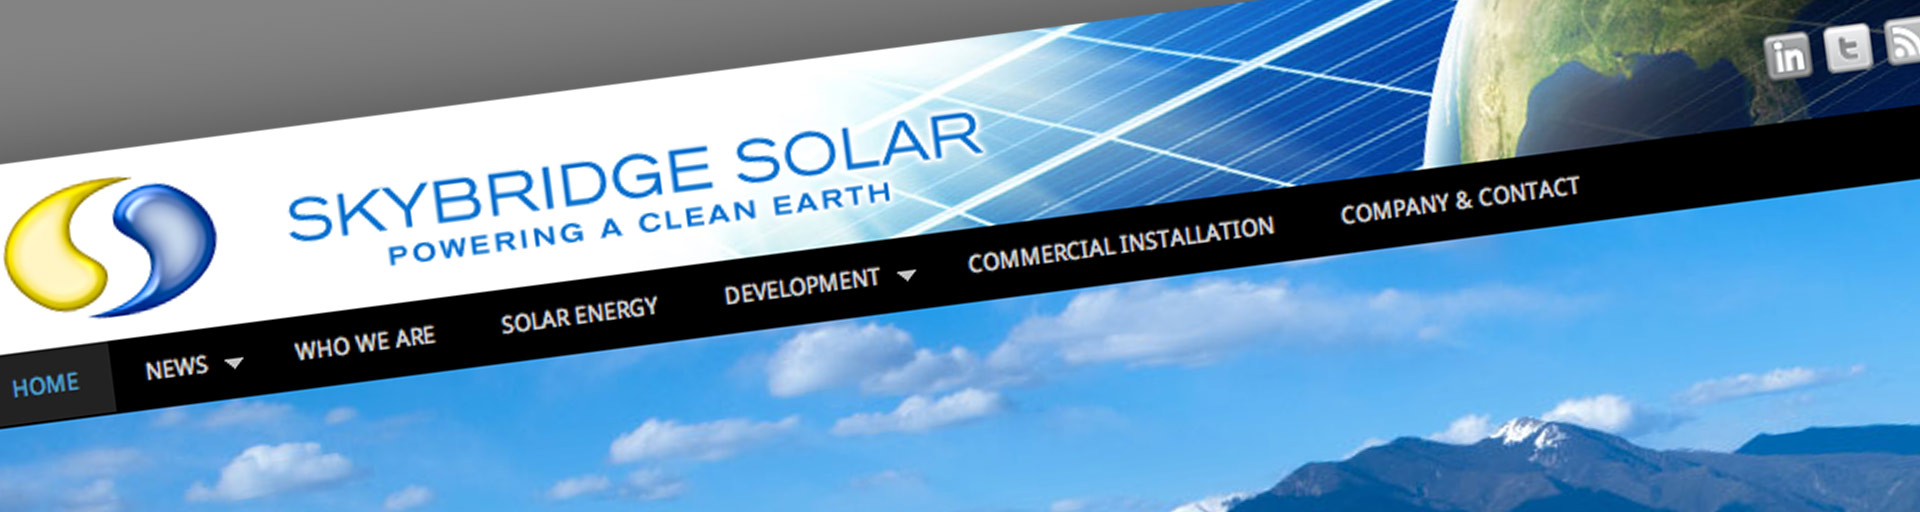 Skybridge Solar Website Header